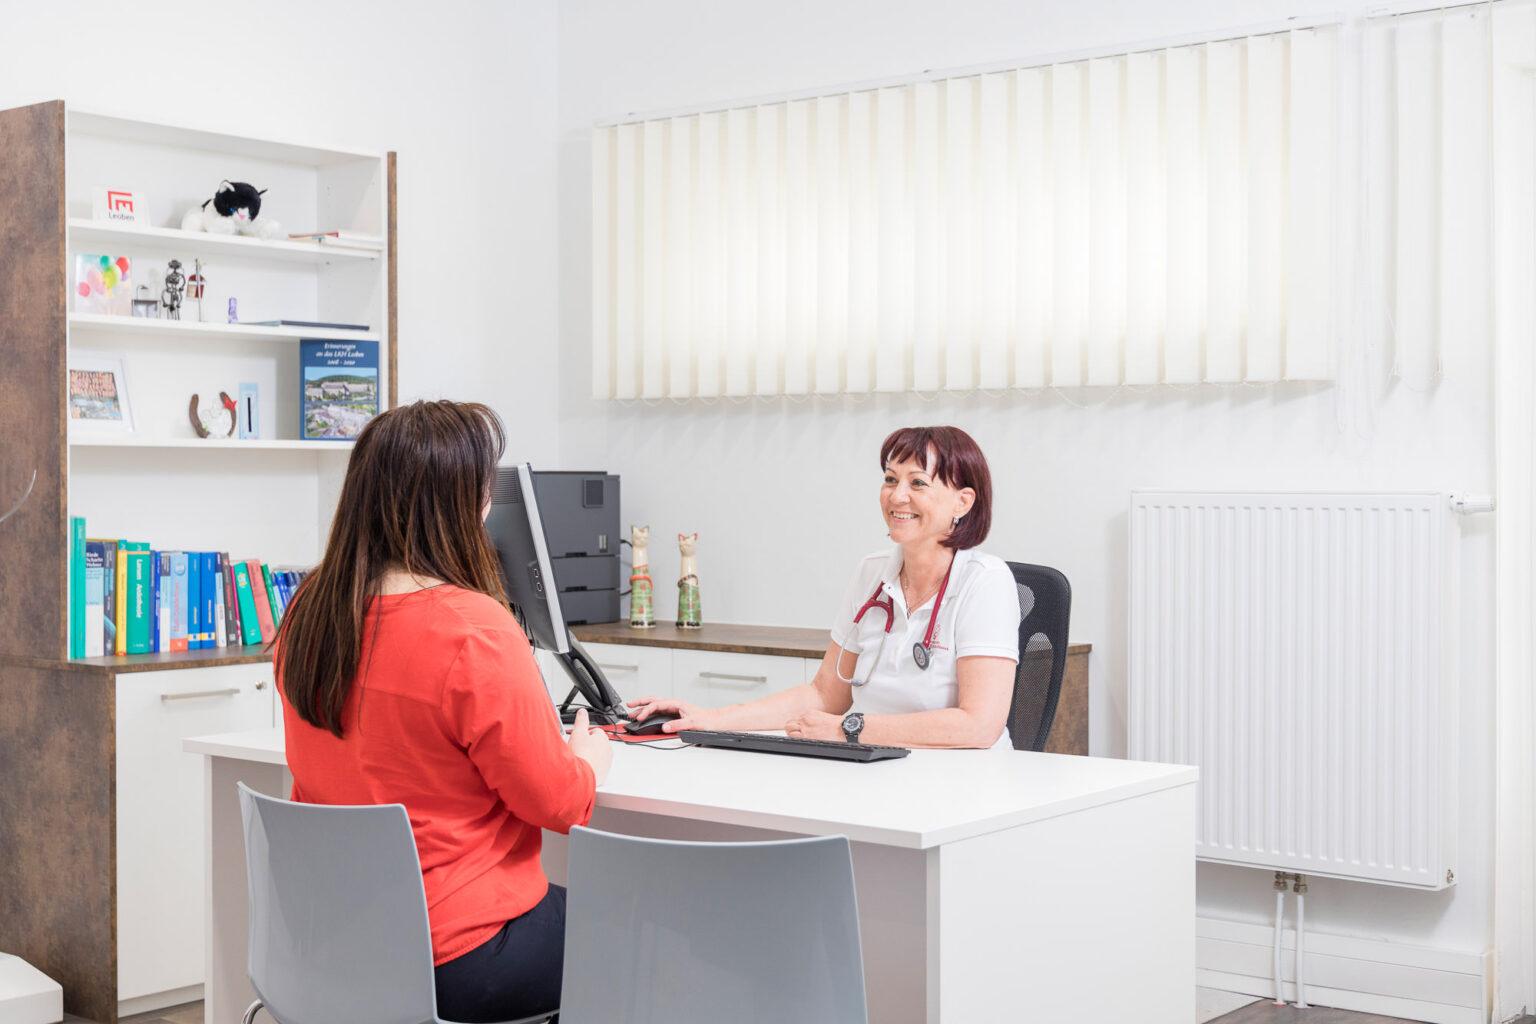 Arzt Patienten Gespräch